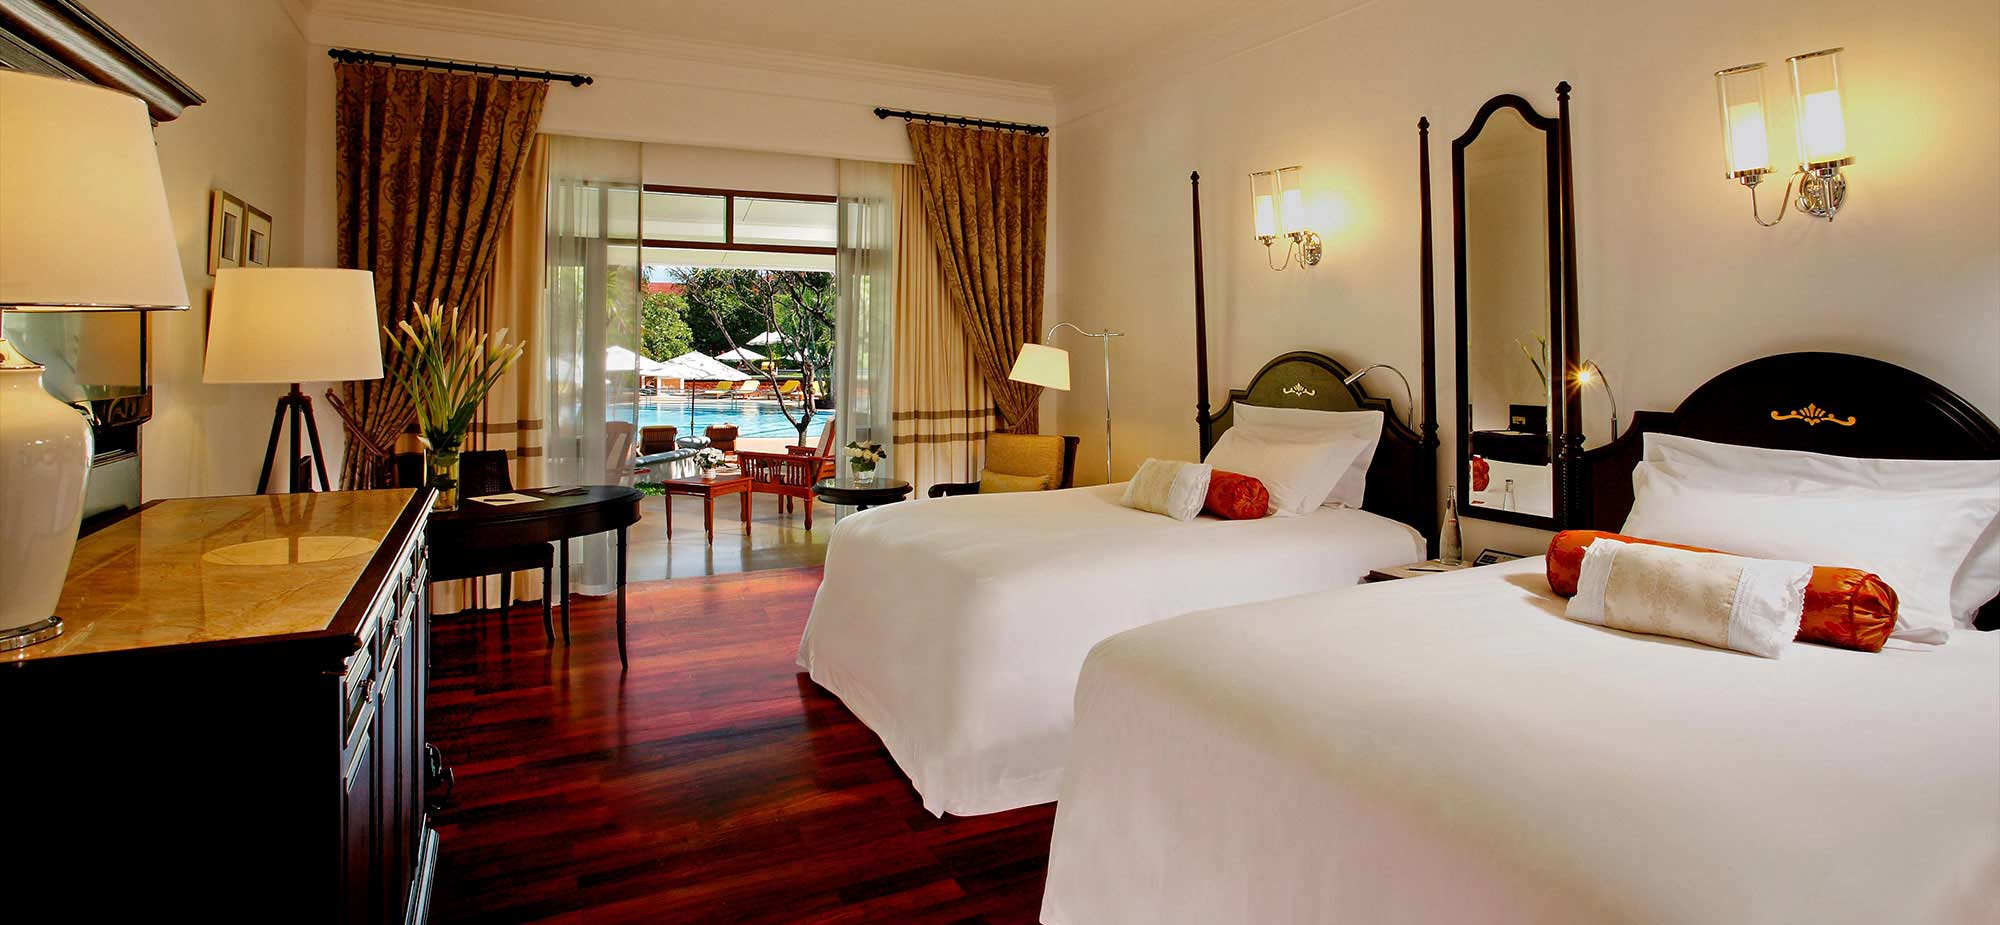 Centara Grand Beach Resort & Villas / Best Hotels In Hua Hin